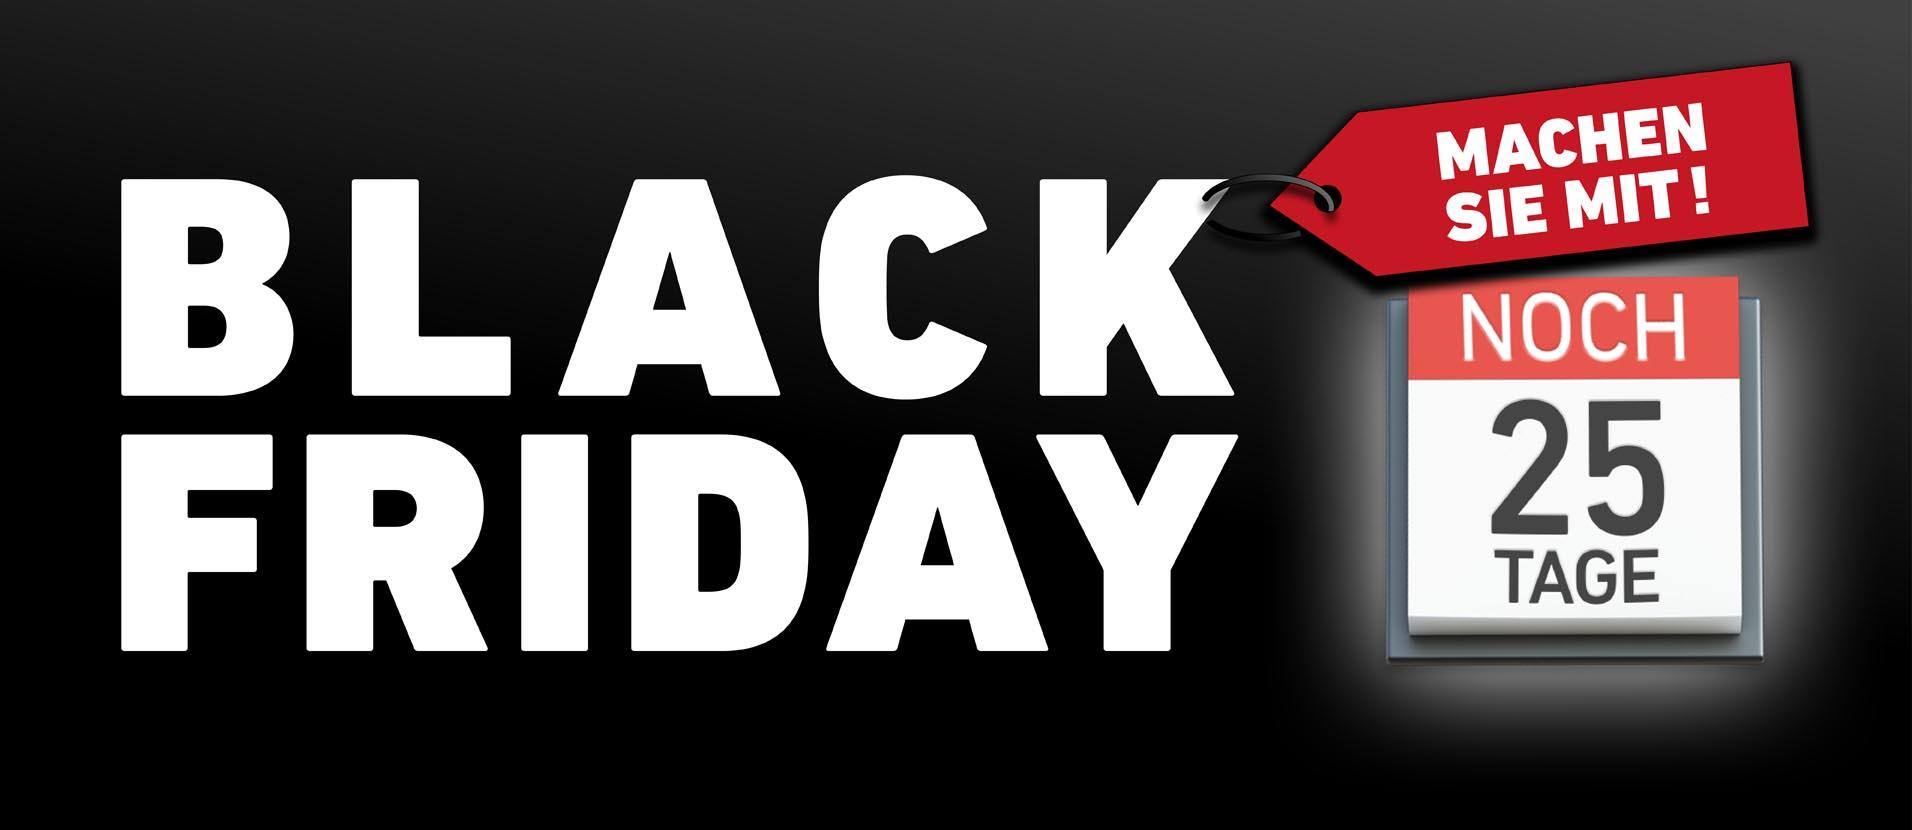 Black-Friday - Noch 25 Tage